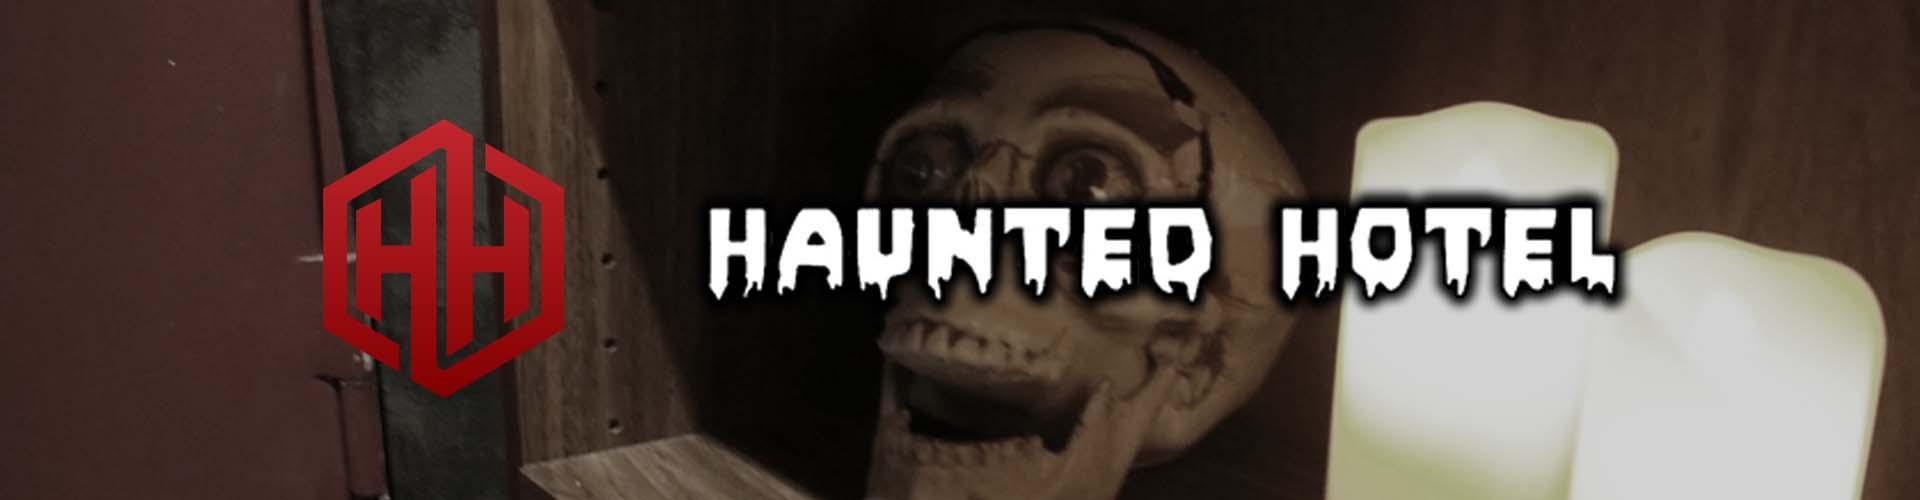 Haunted Hotel Banner